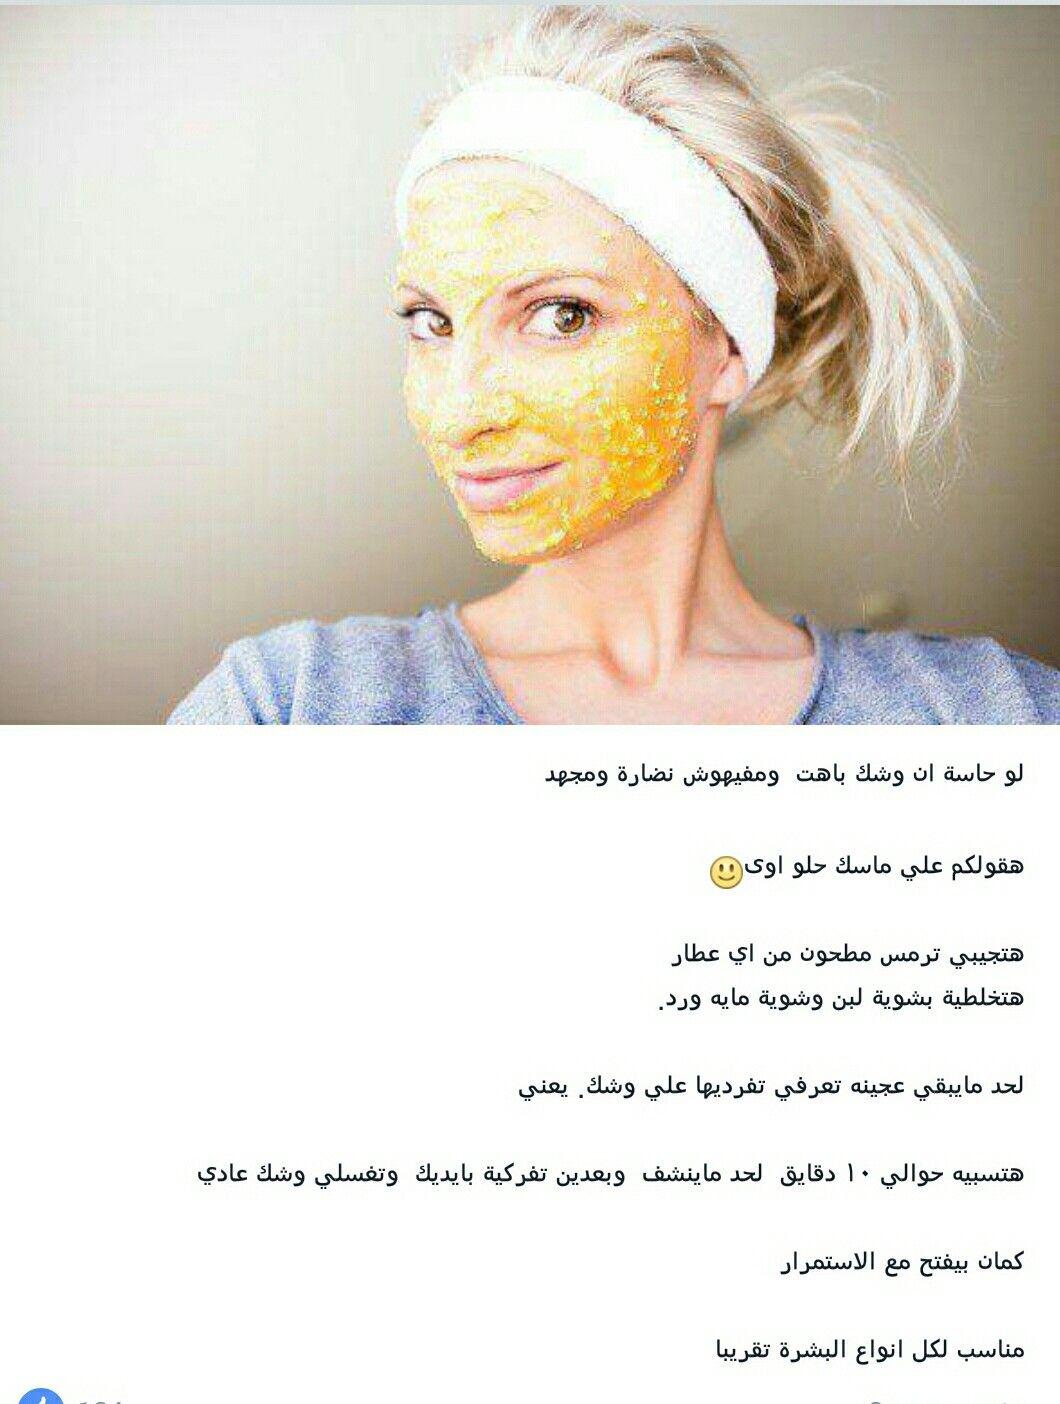 ماسك الترمس لتفتيح ونضارة الوجه Skin Care Women Face Care Skin Care